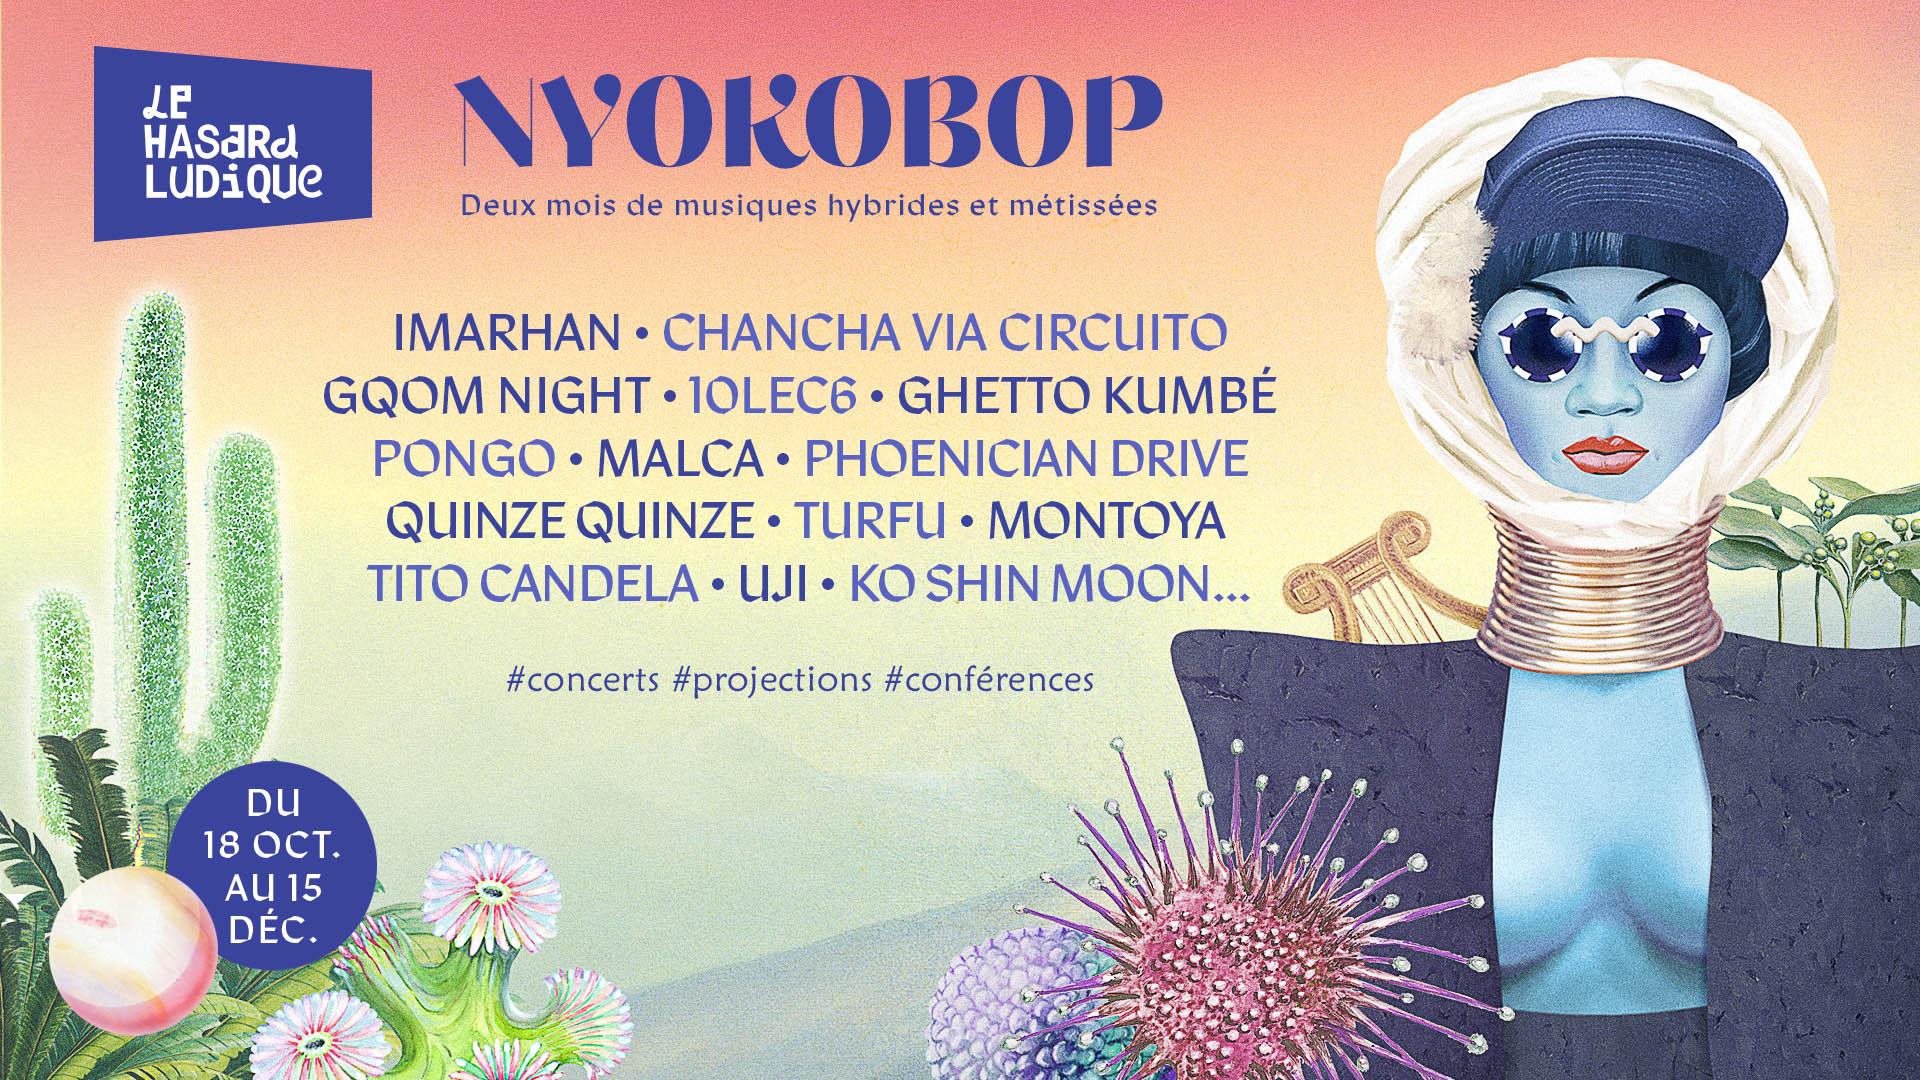 Le festival Nyokobop au Hasard Ludique.